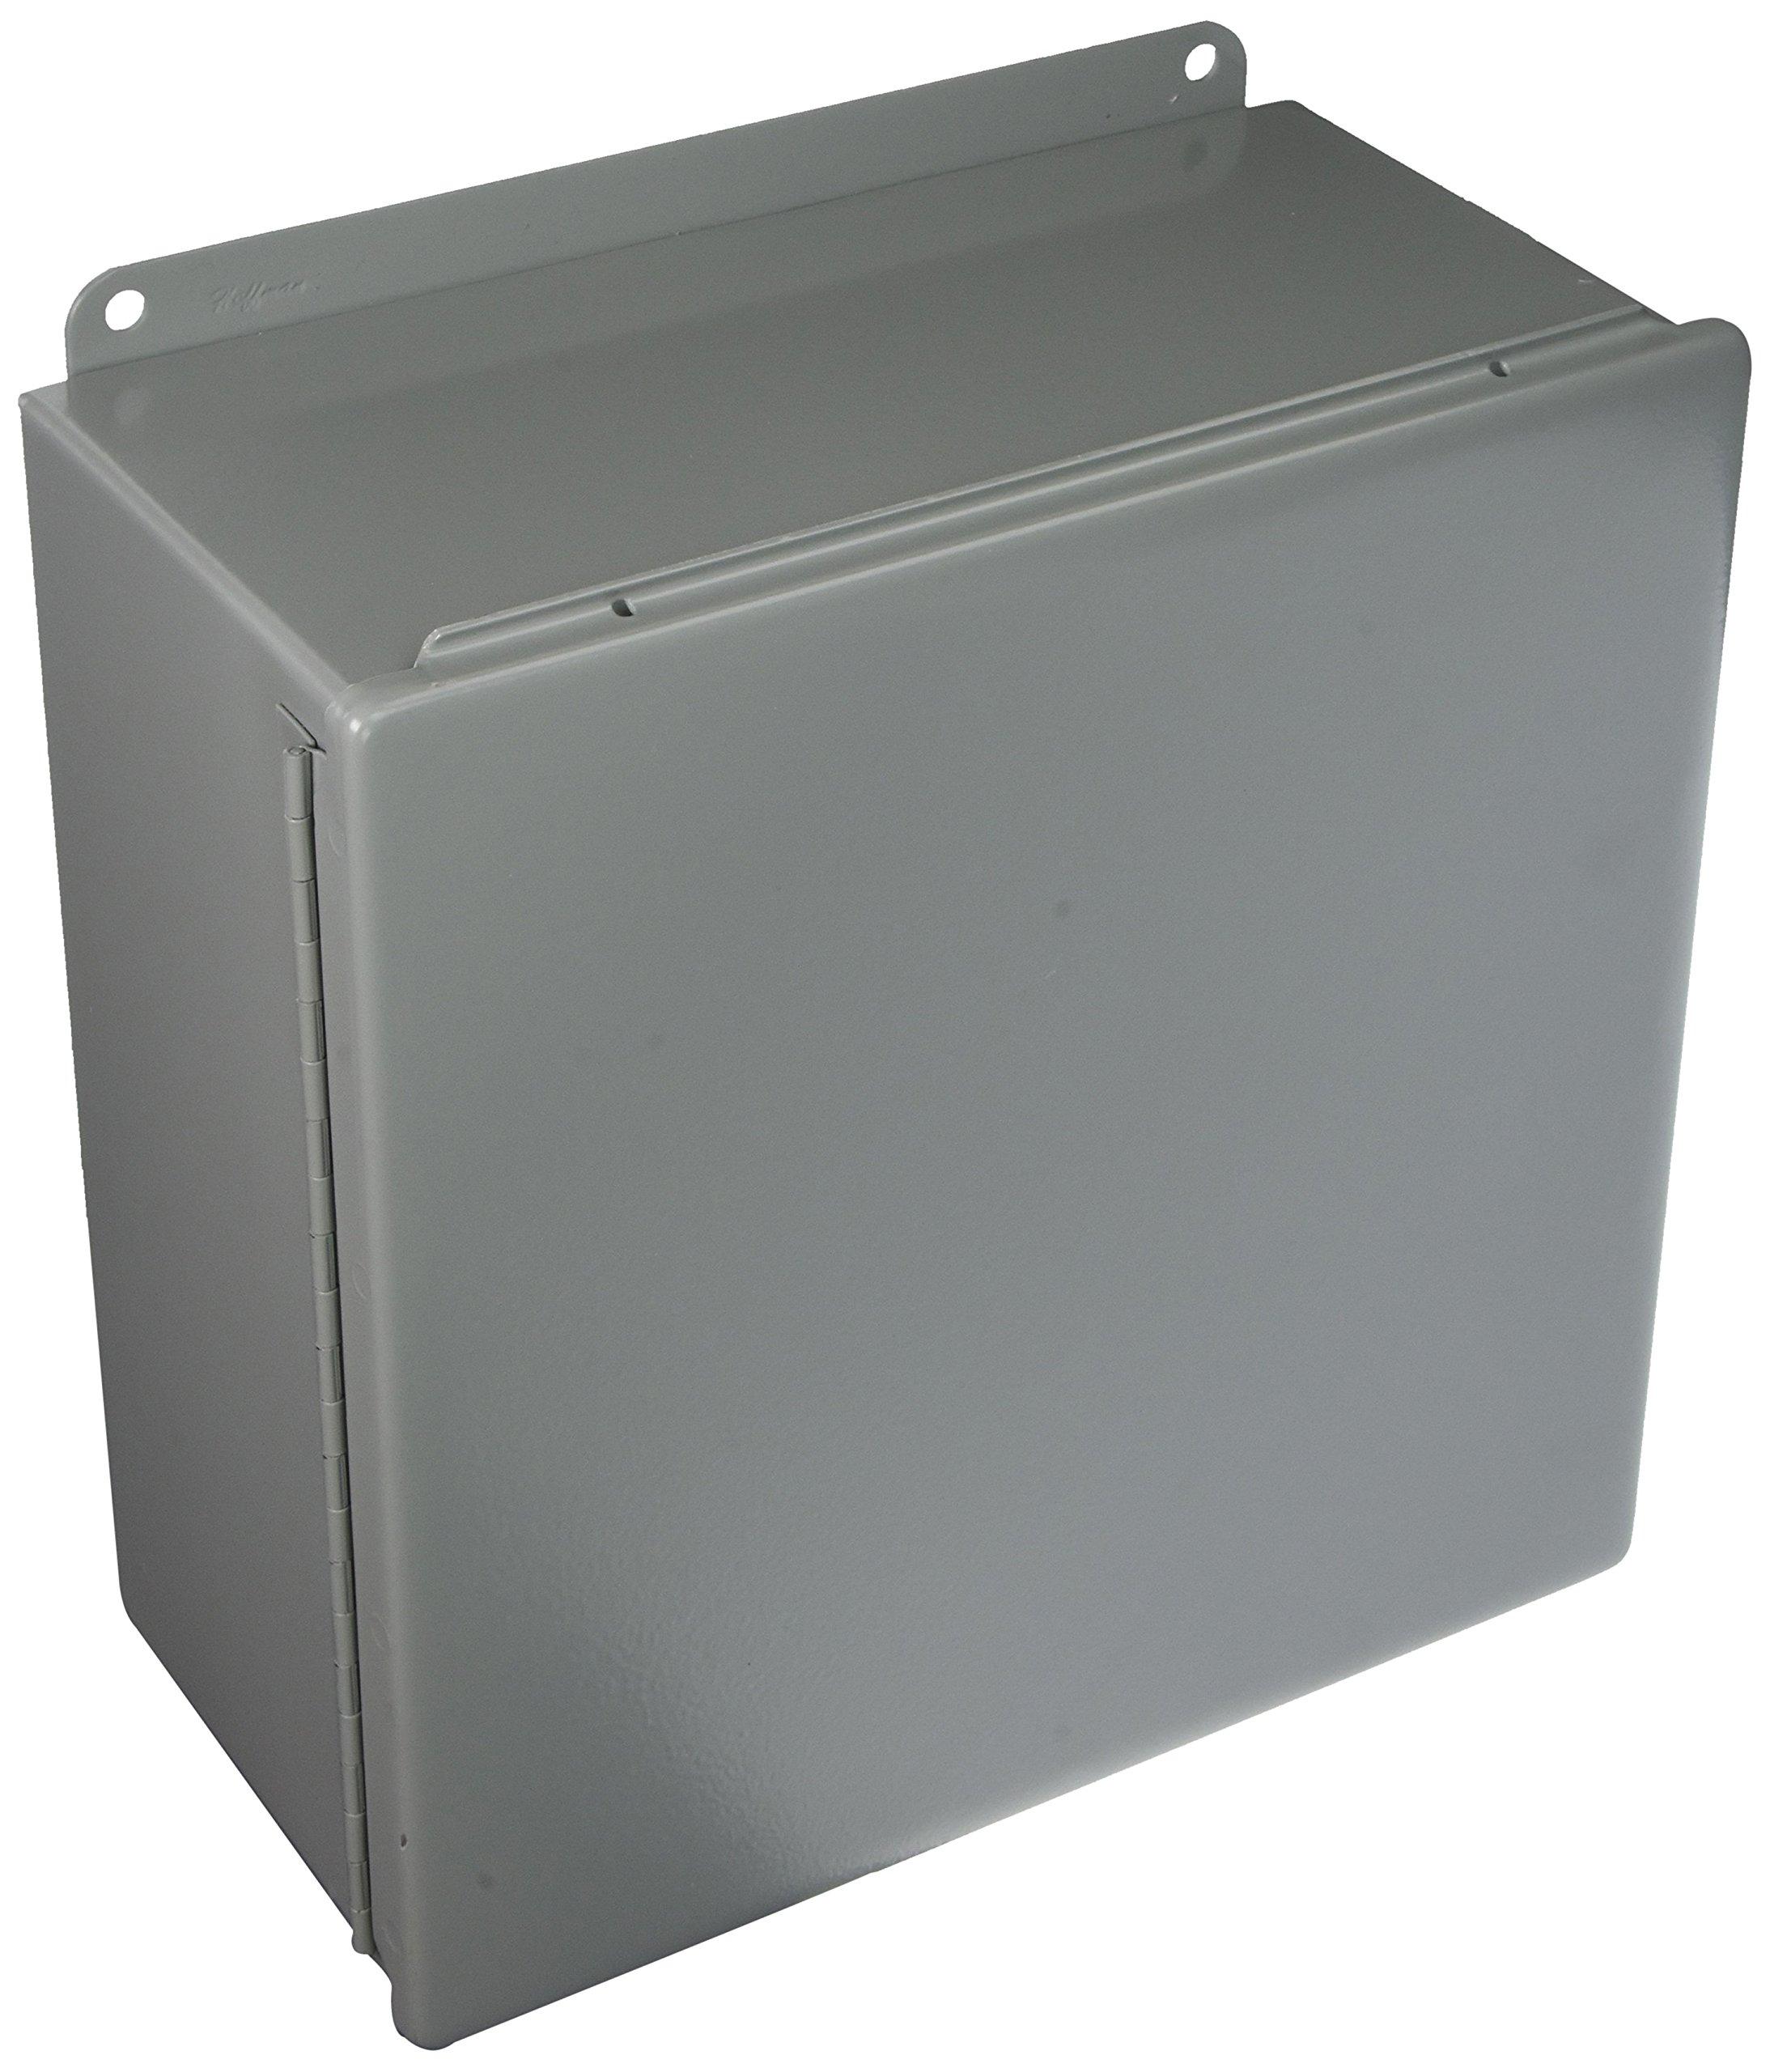 Hoffman A1212CH J Box, NEMA 12, Hinged Cover, Steel, 12.00'' x 12.00'' x 6.00'', Gray